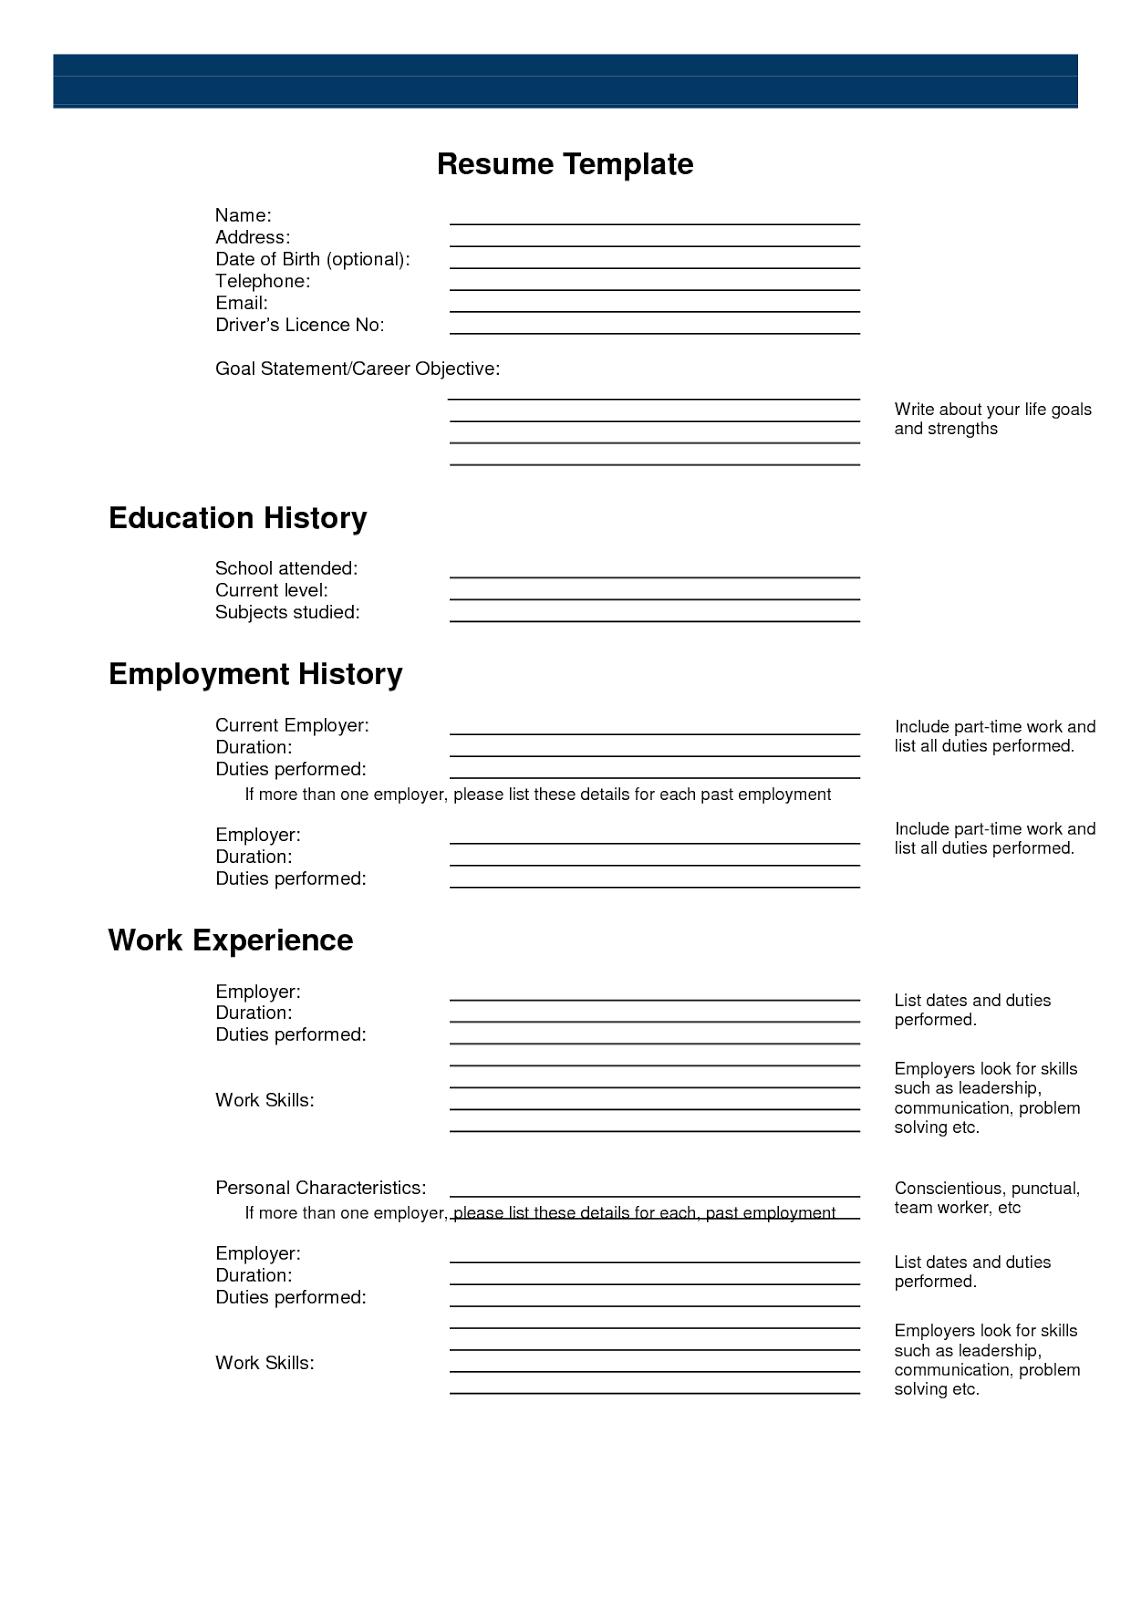 Free Resume Templates  Formate  Printable Sample